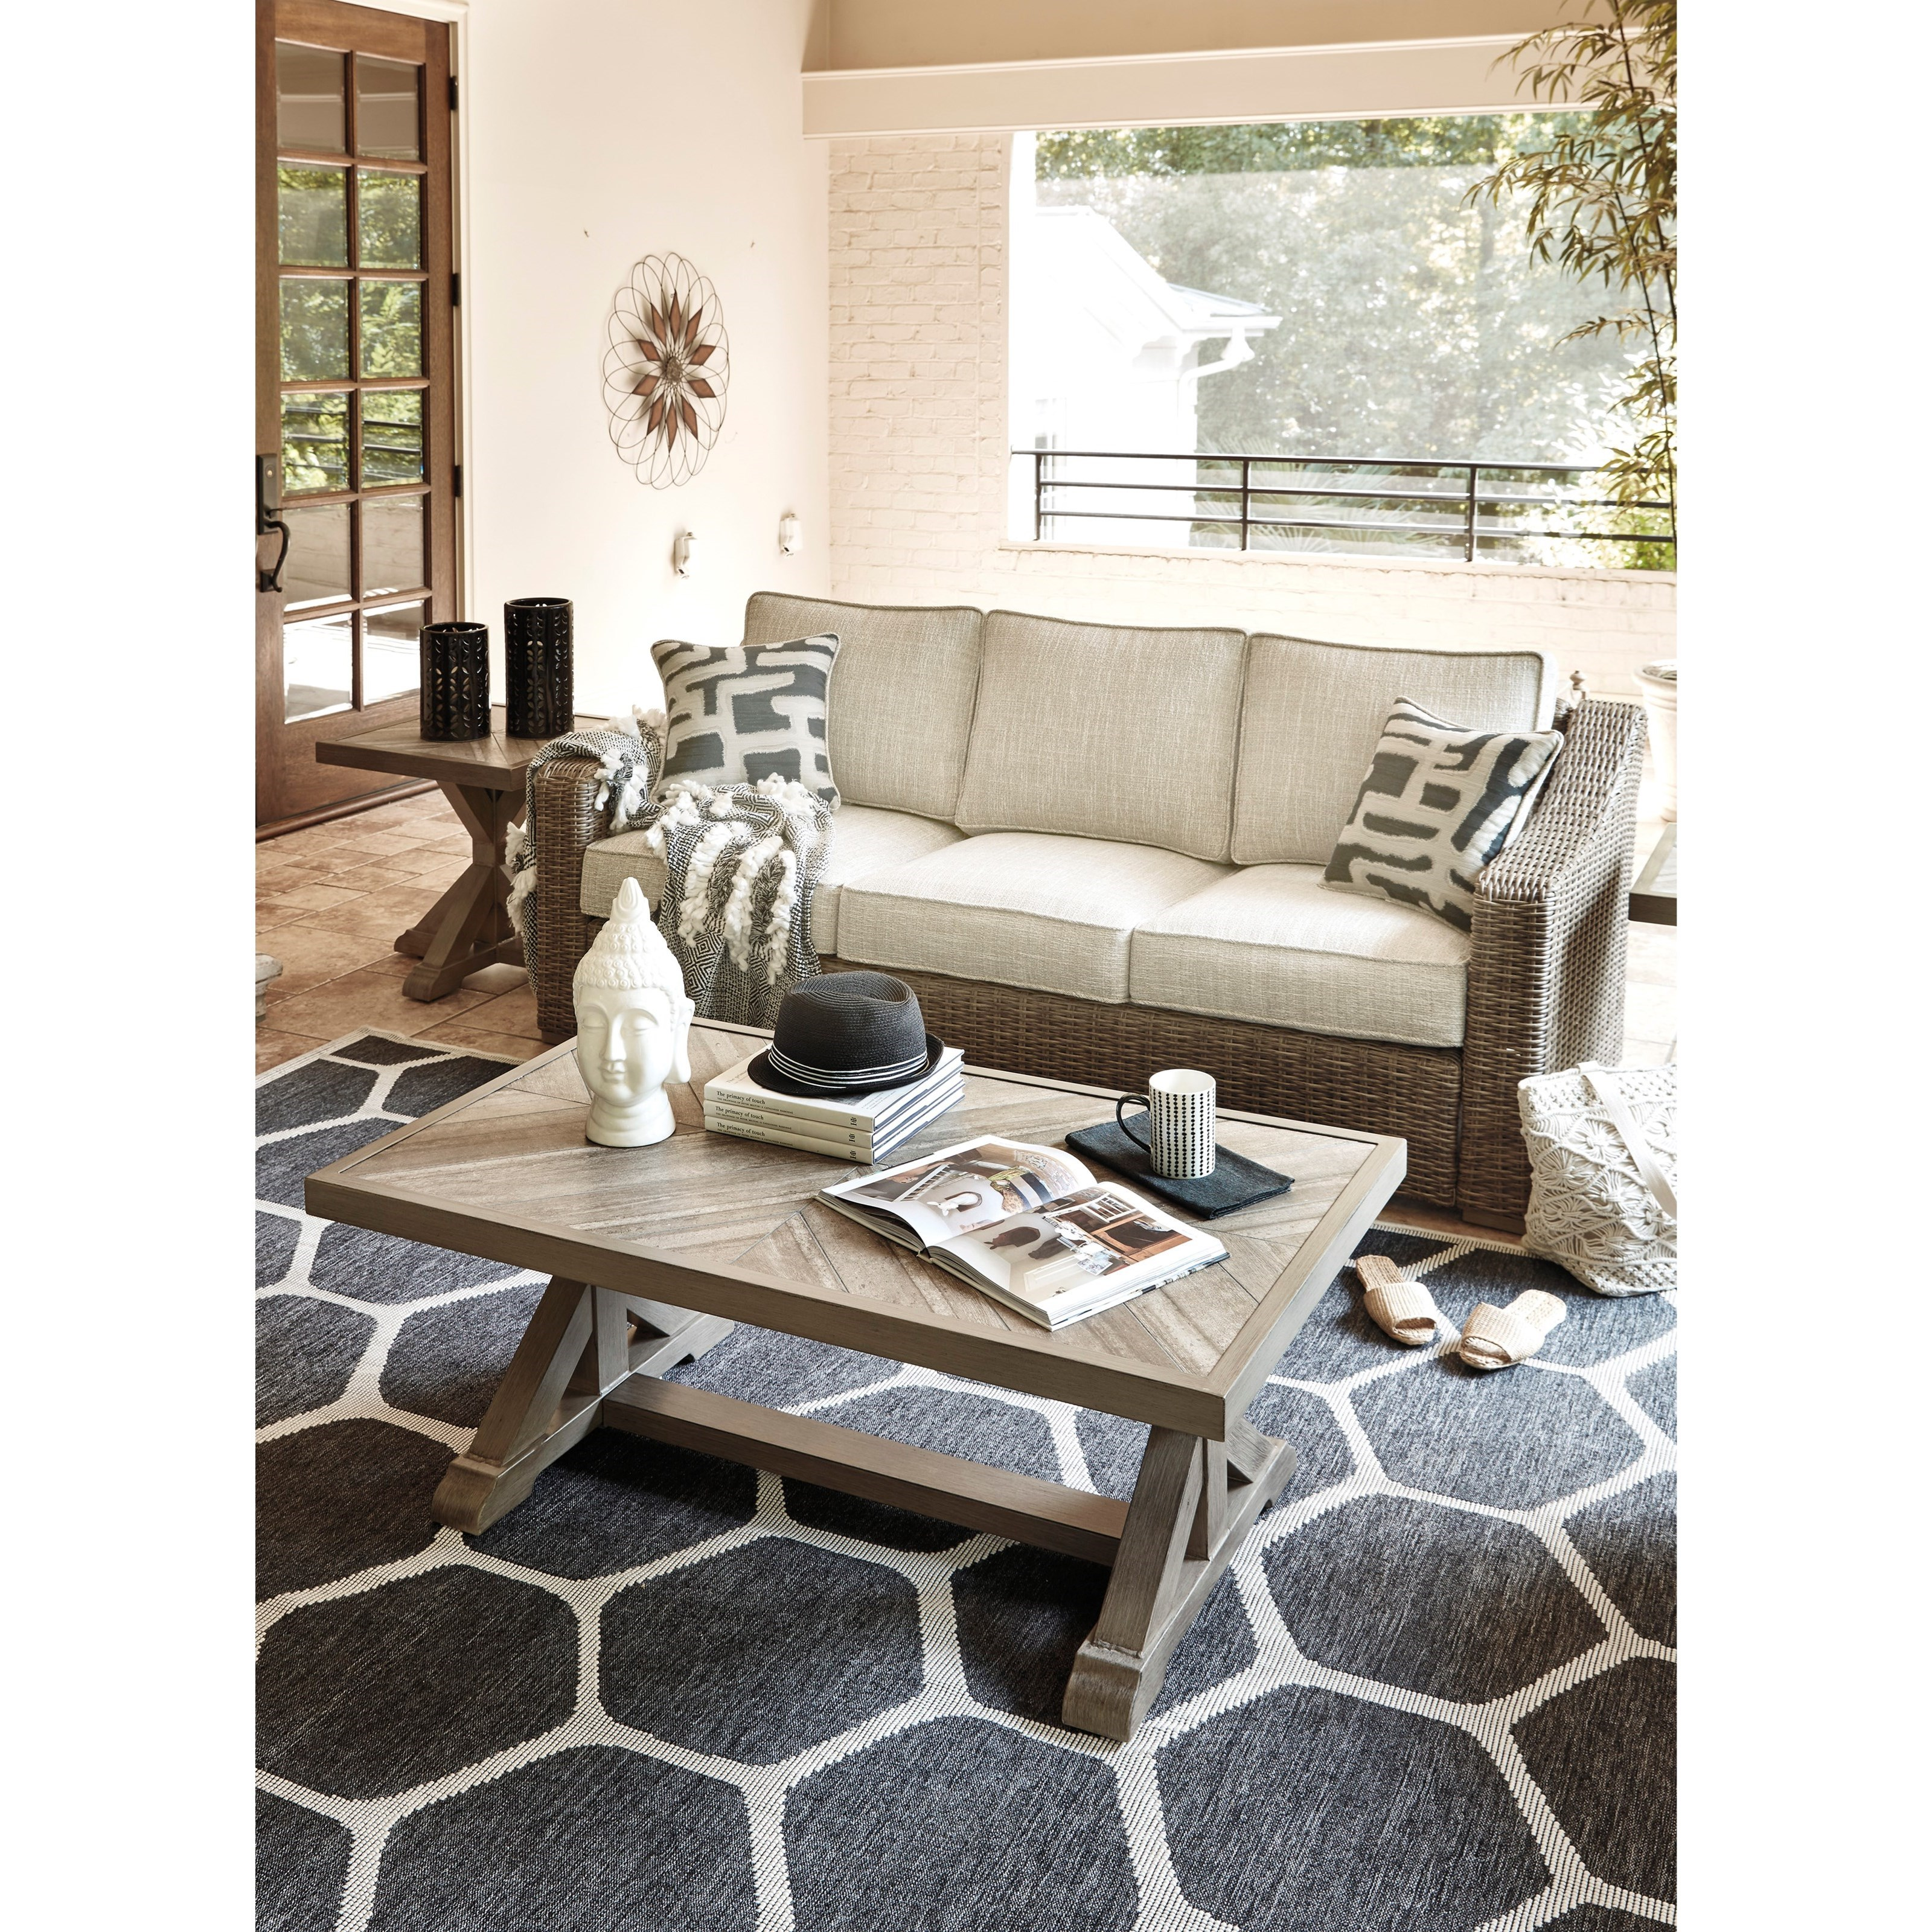 Signature Design By Ashley Beachcroft Sofa With Cushion